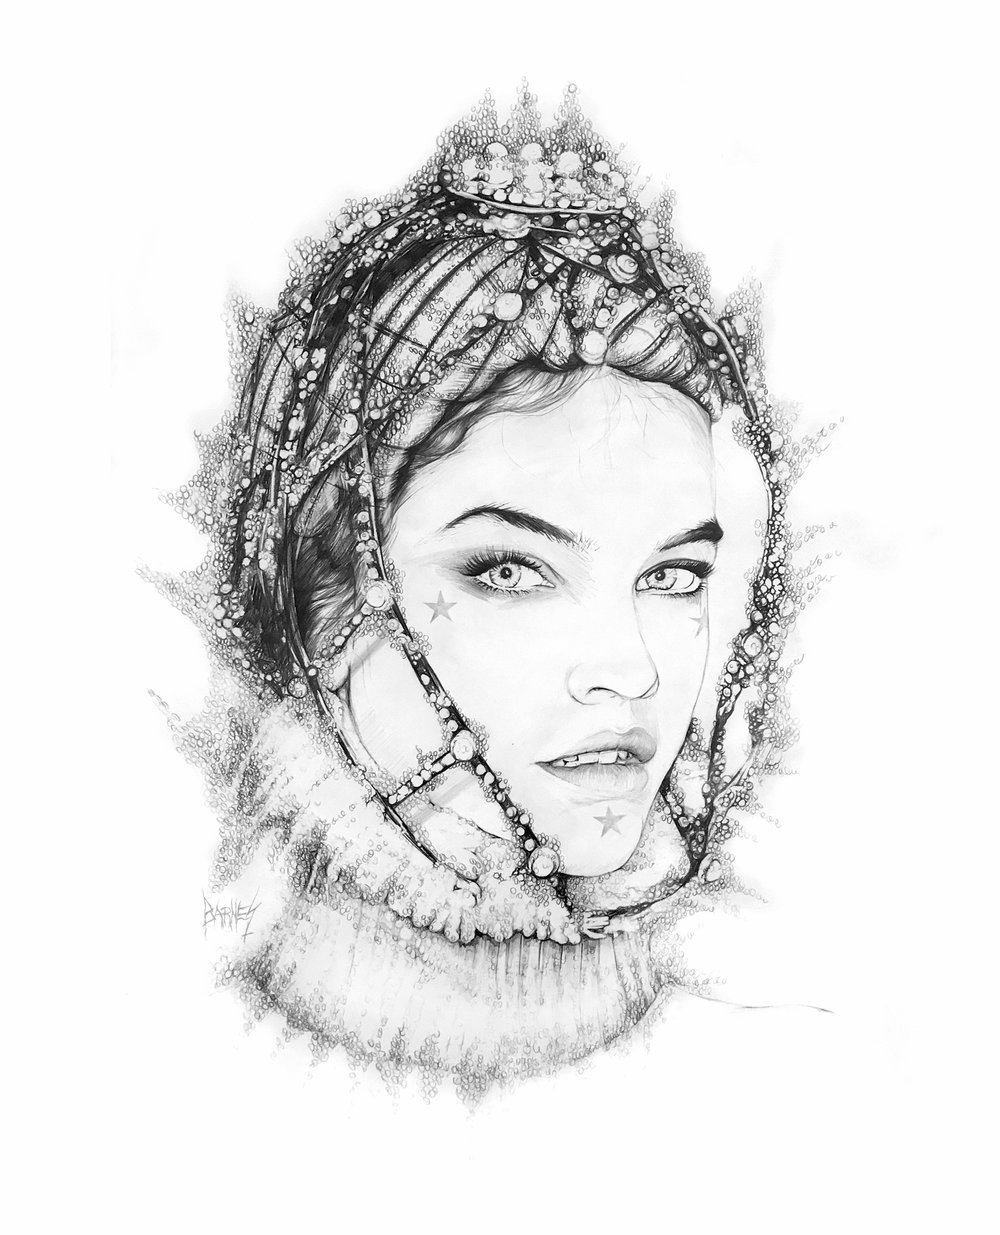 BBKUNST-Art-Artist-Bryan-Barnes-Pencil-Art-Drawing_Barbara_Palvin_Hungarian_Princess_Under_An_Aquarius_Moon.jpg